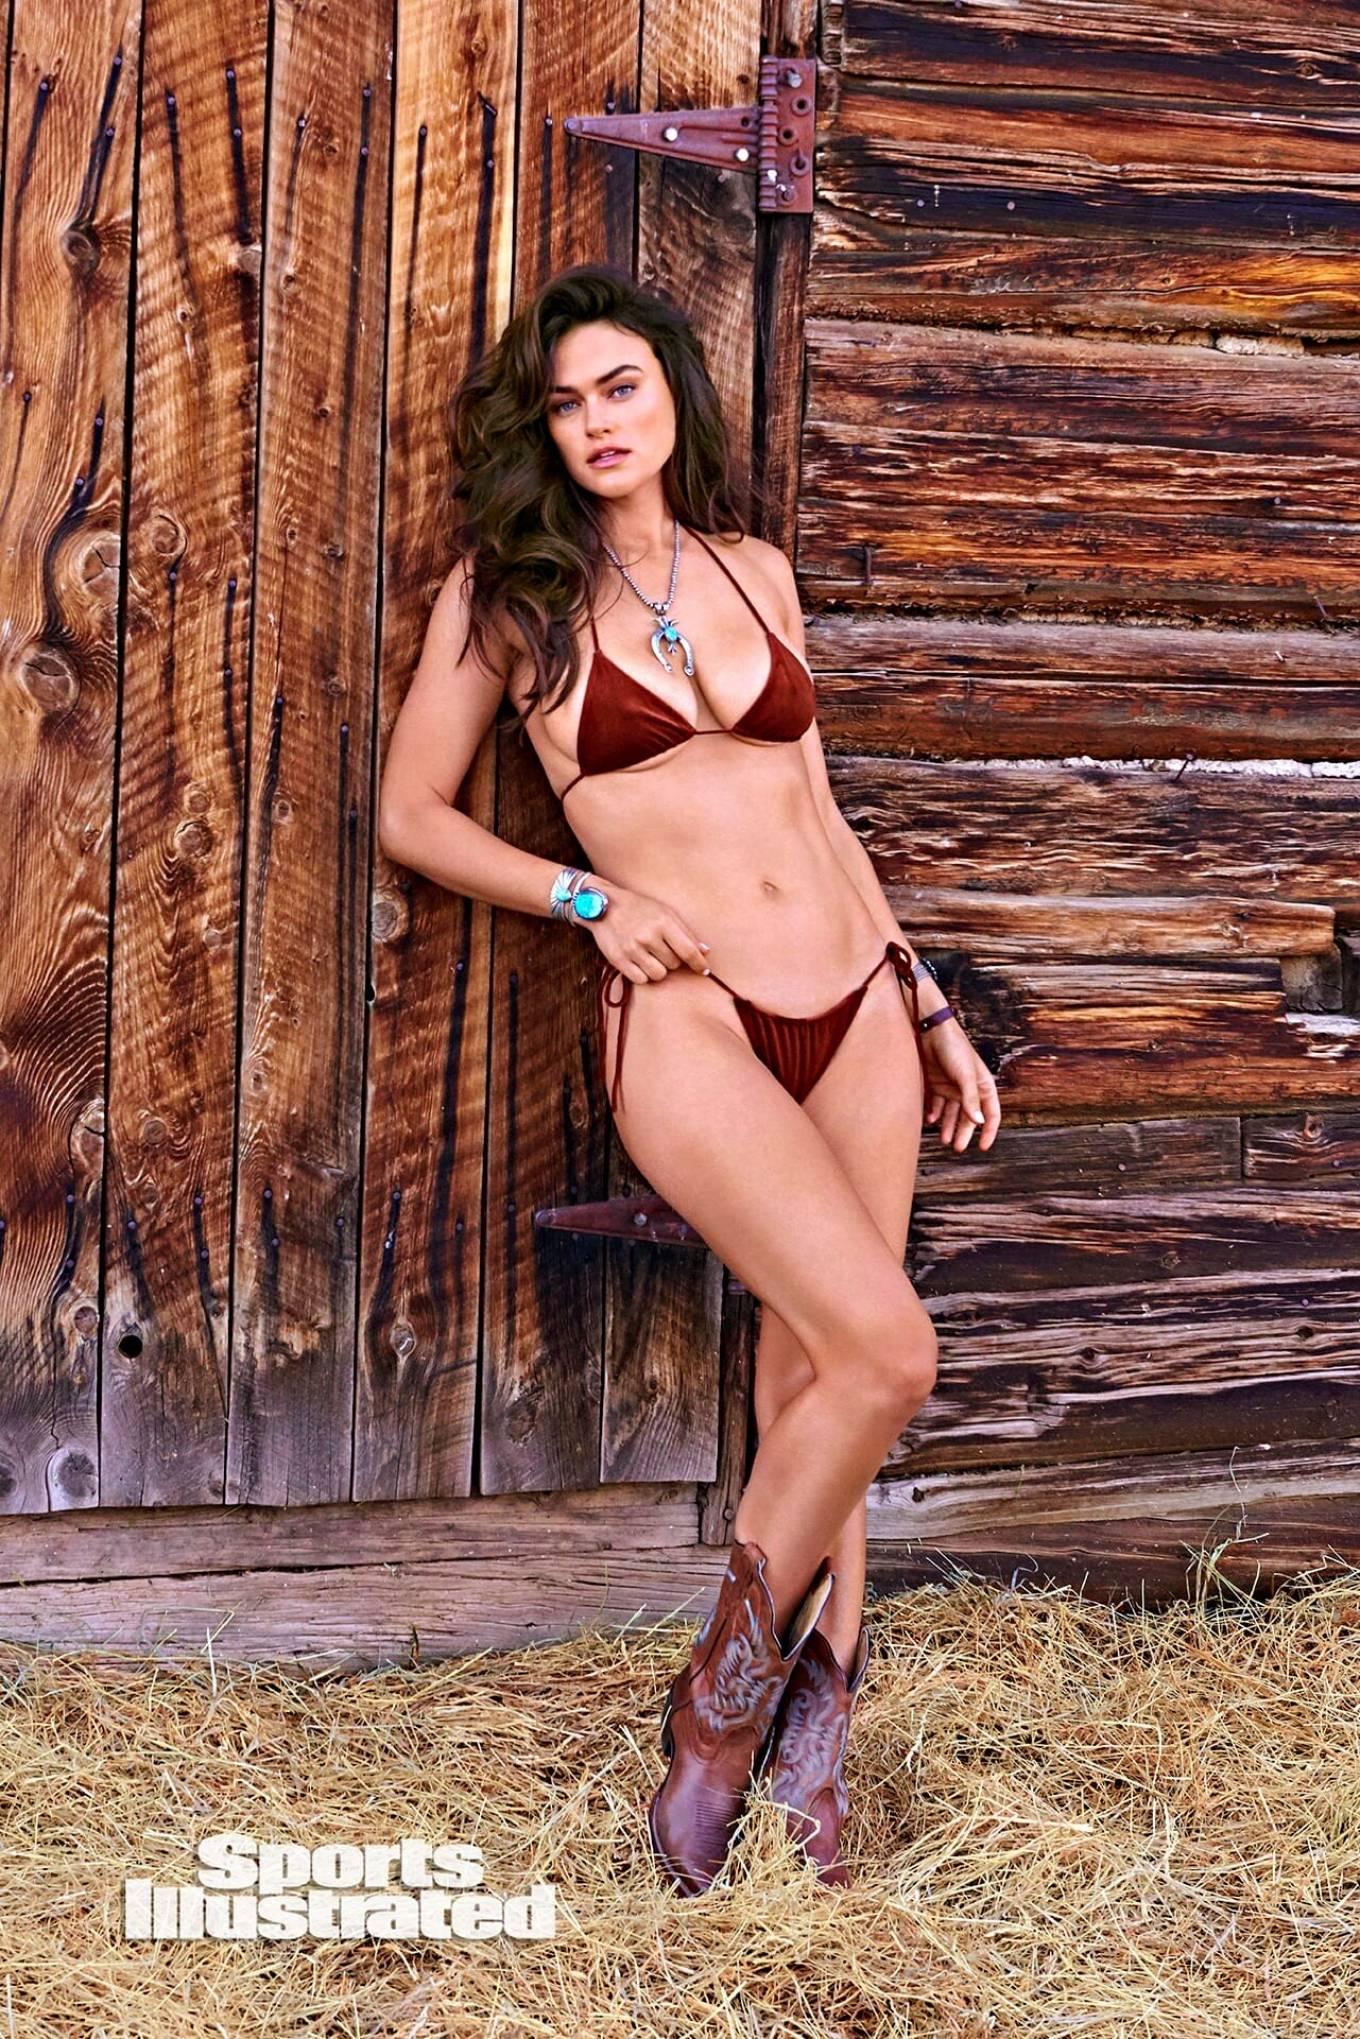 Myla Dalbesio SI Swimsuit Model Page - Swimsuit   SI.com